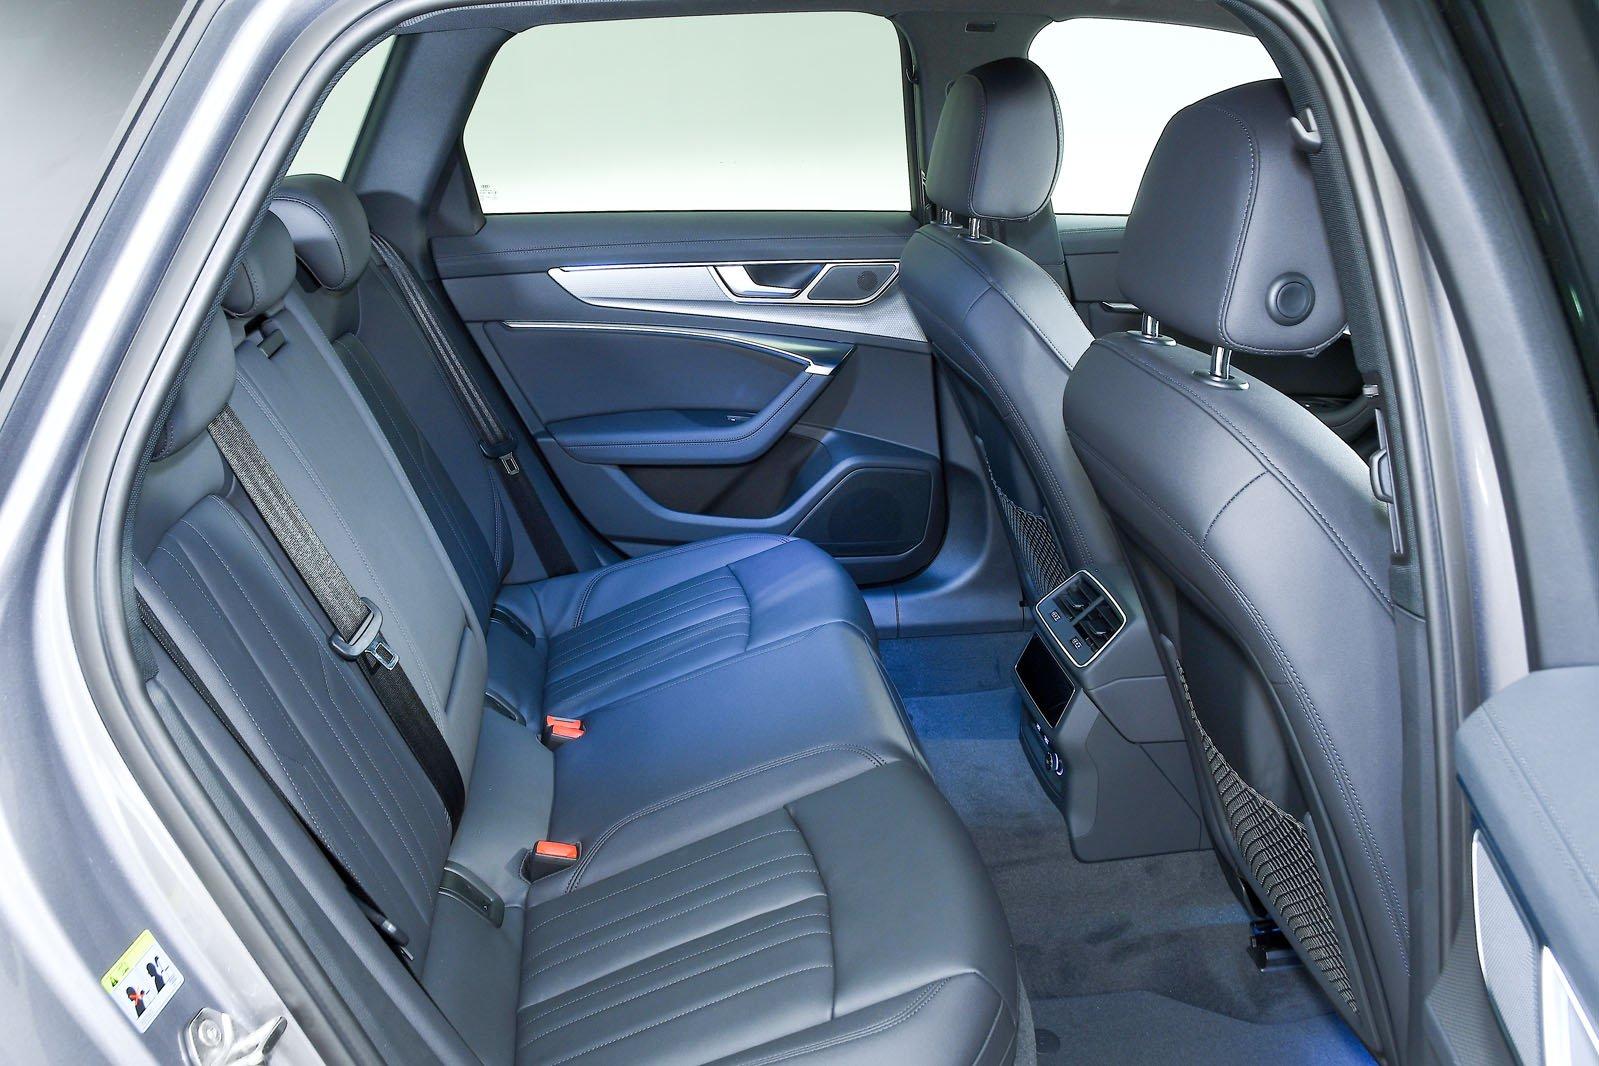 Audi A6 Allroad rear